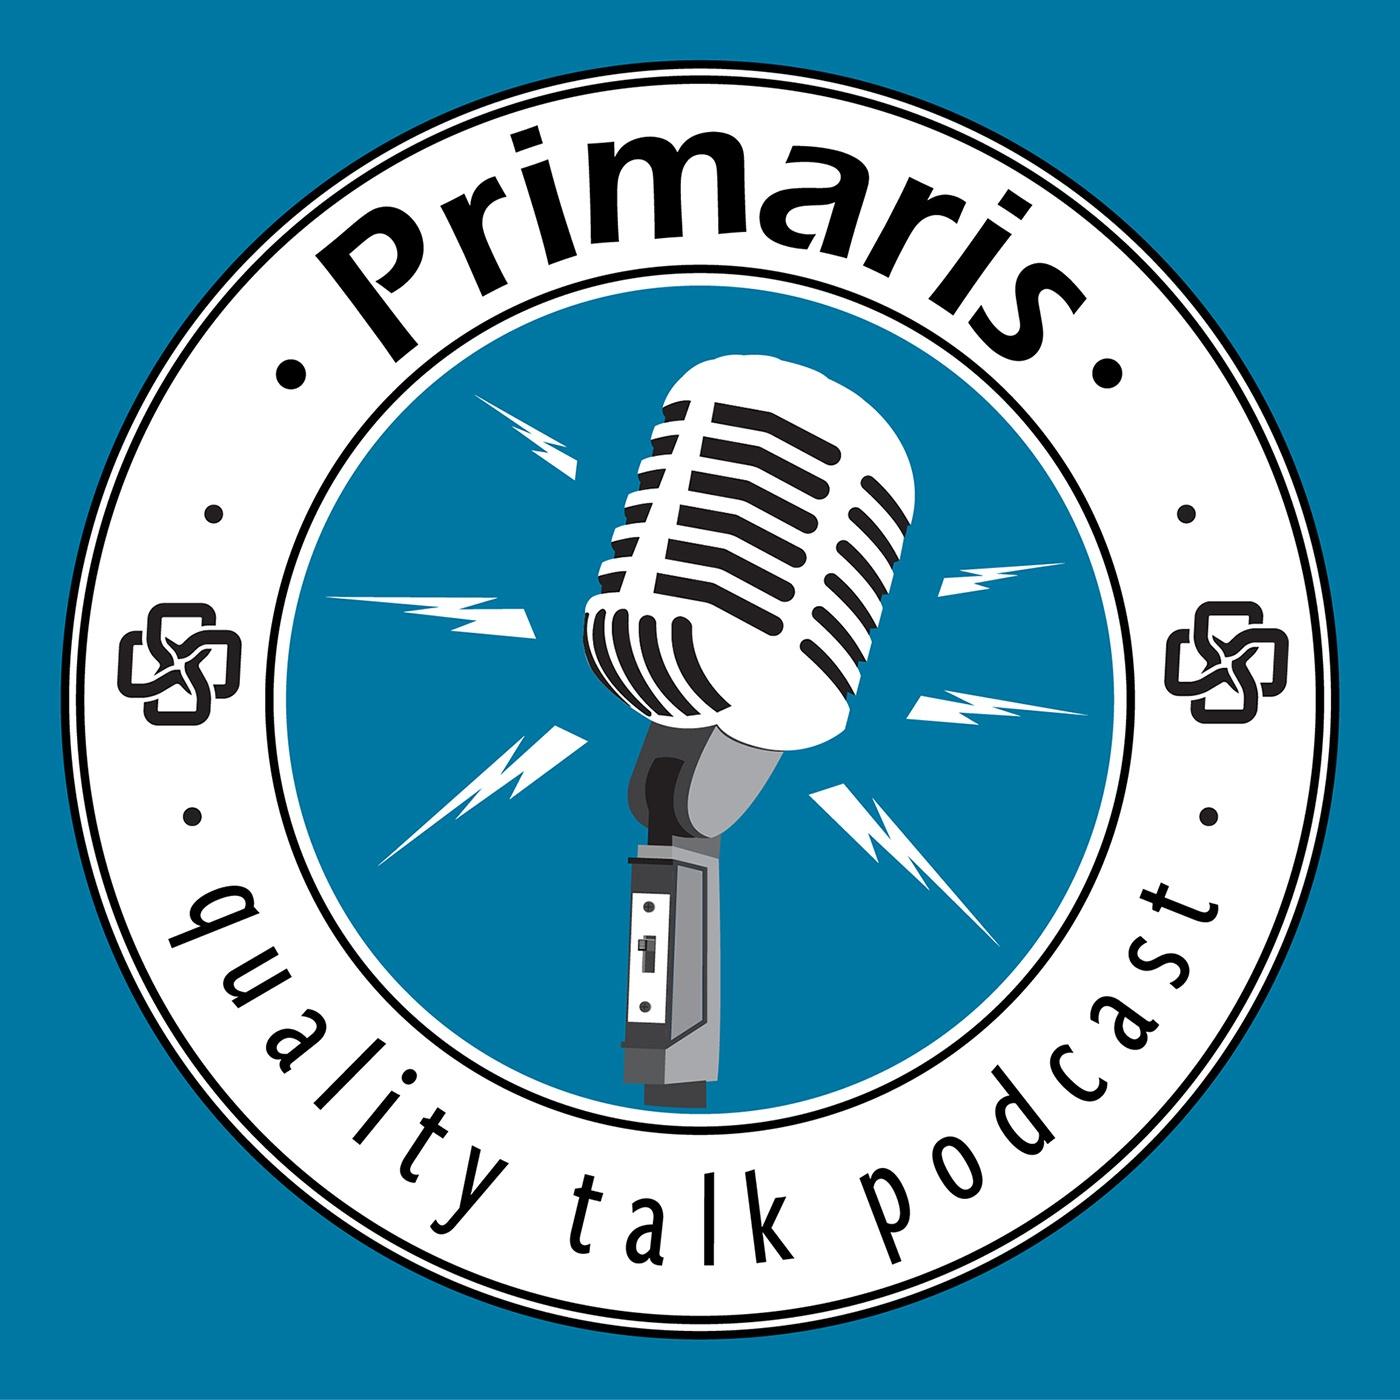 Quality Talk Podcast Logo 1400x1400.jpg